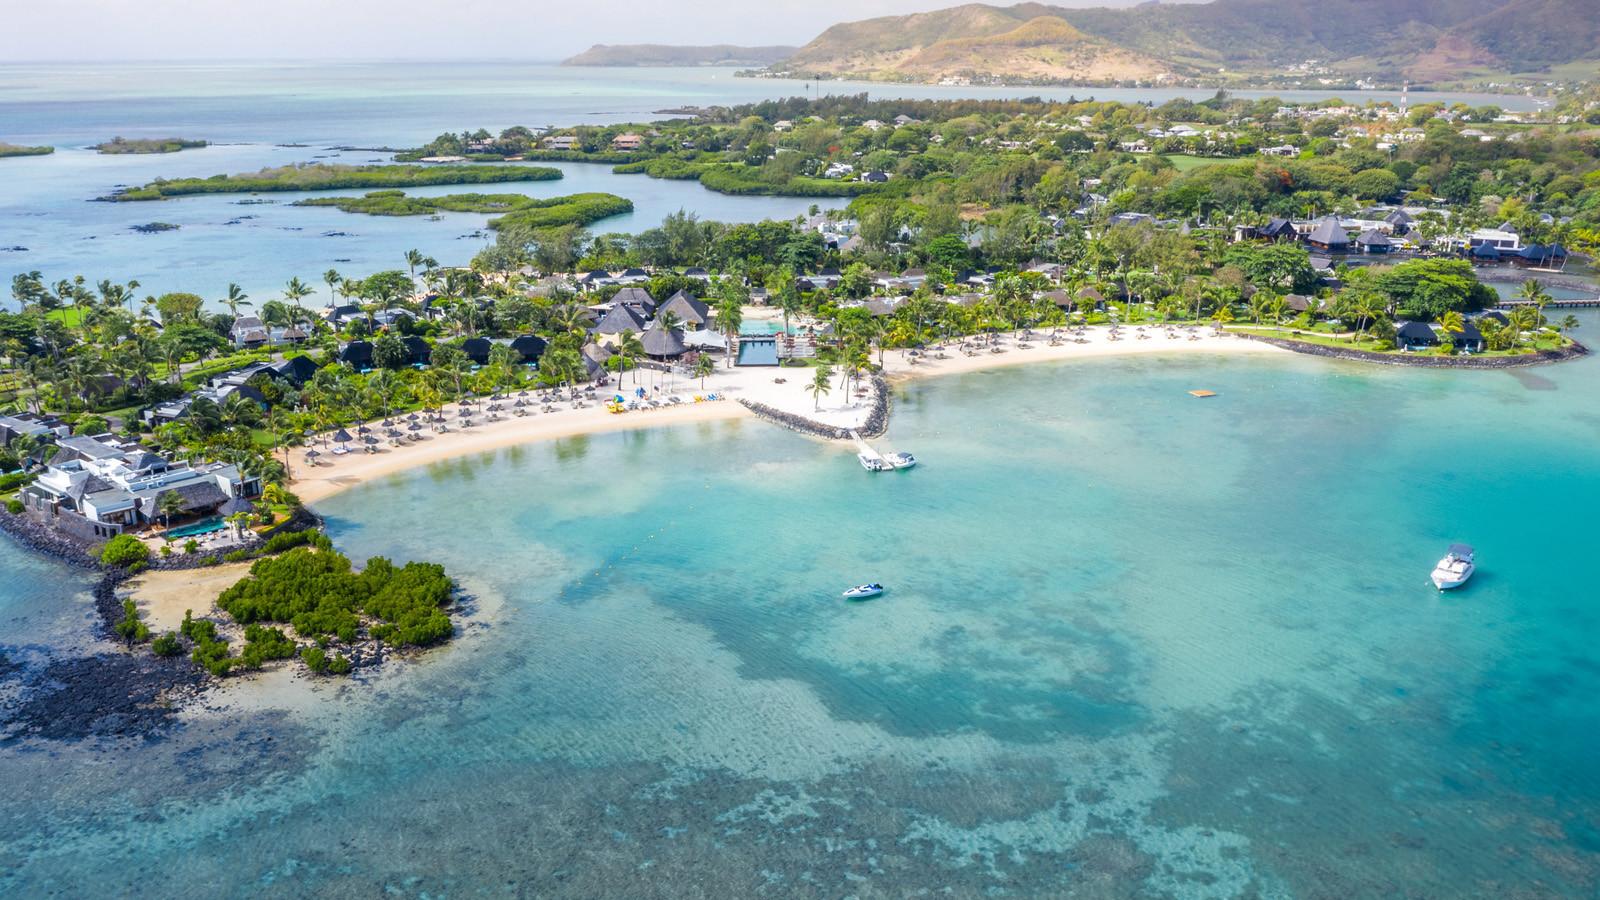 news-main-four-seasons-resort-mauritius-at-anahita-reveals-refreshed-design-of-one-bedroom-villas.1594121646.jpg